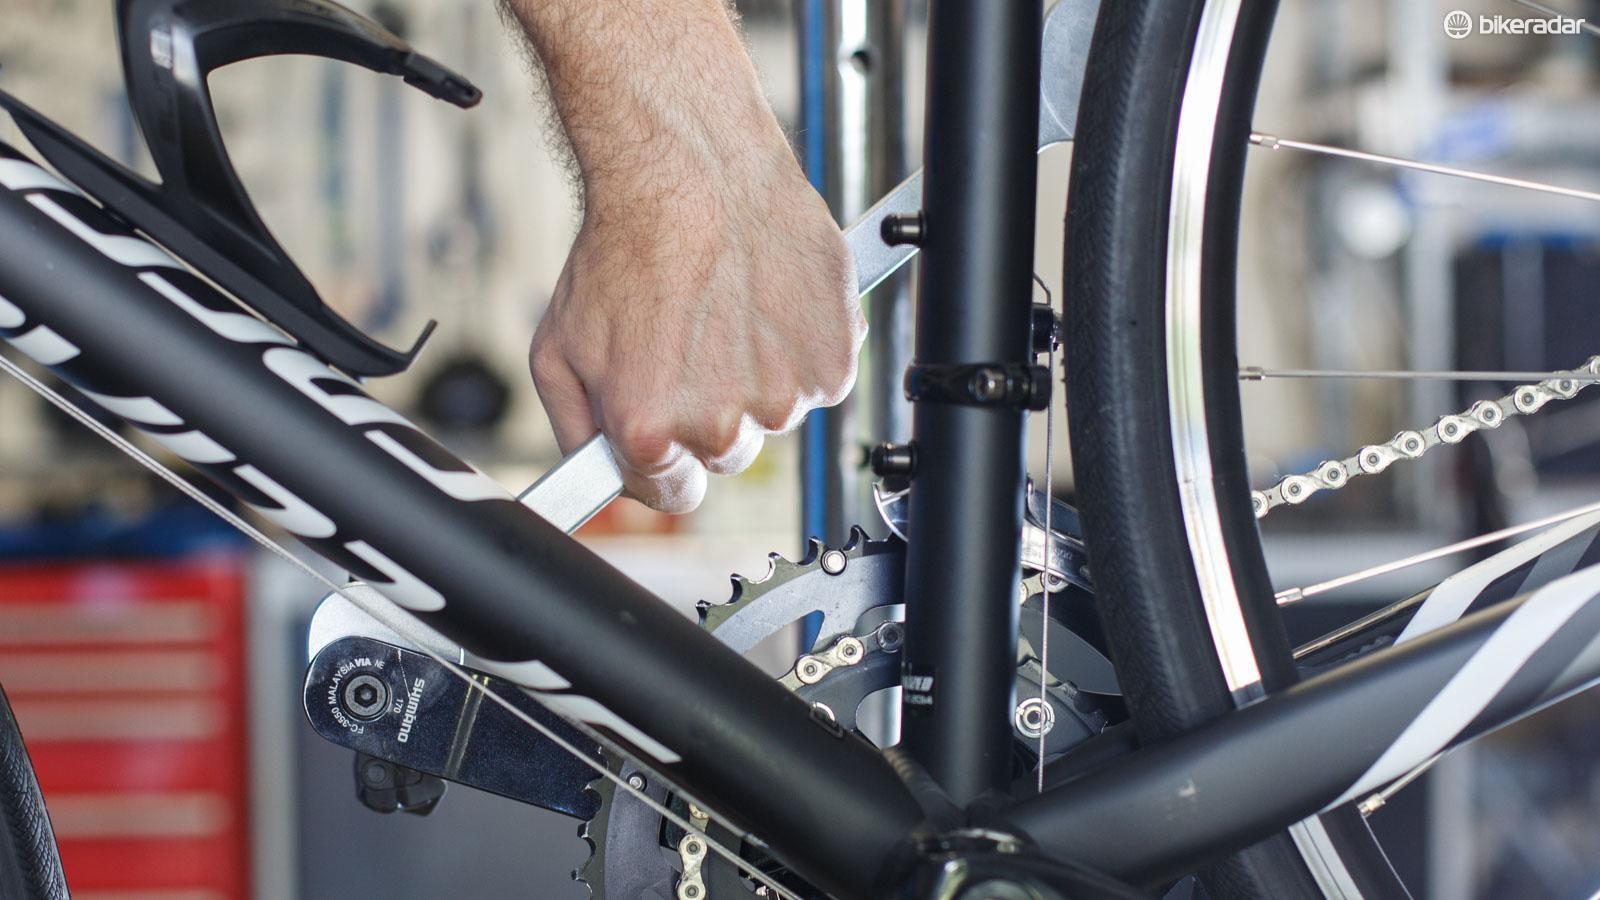 Never undo pedals toward the chainring